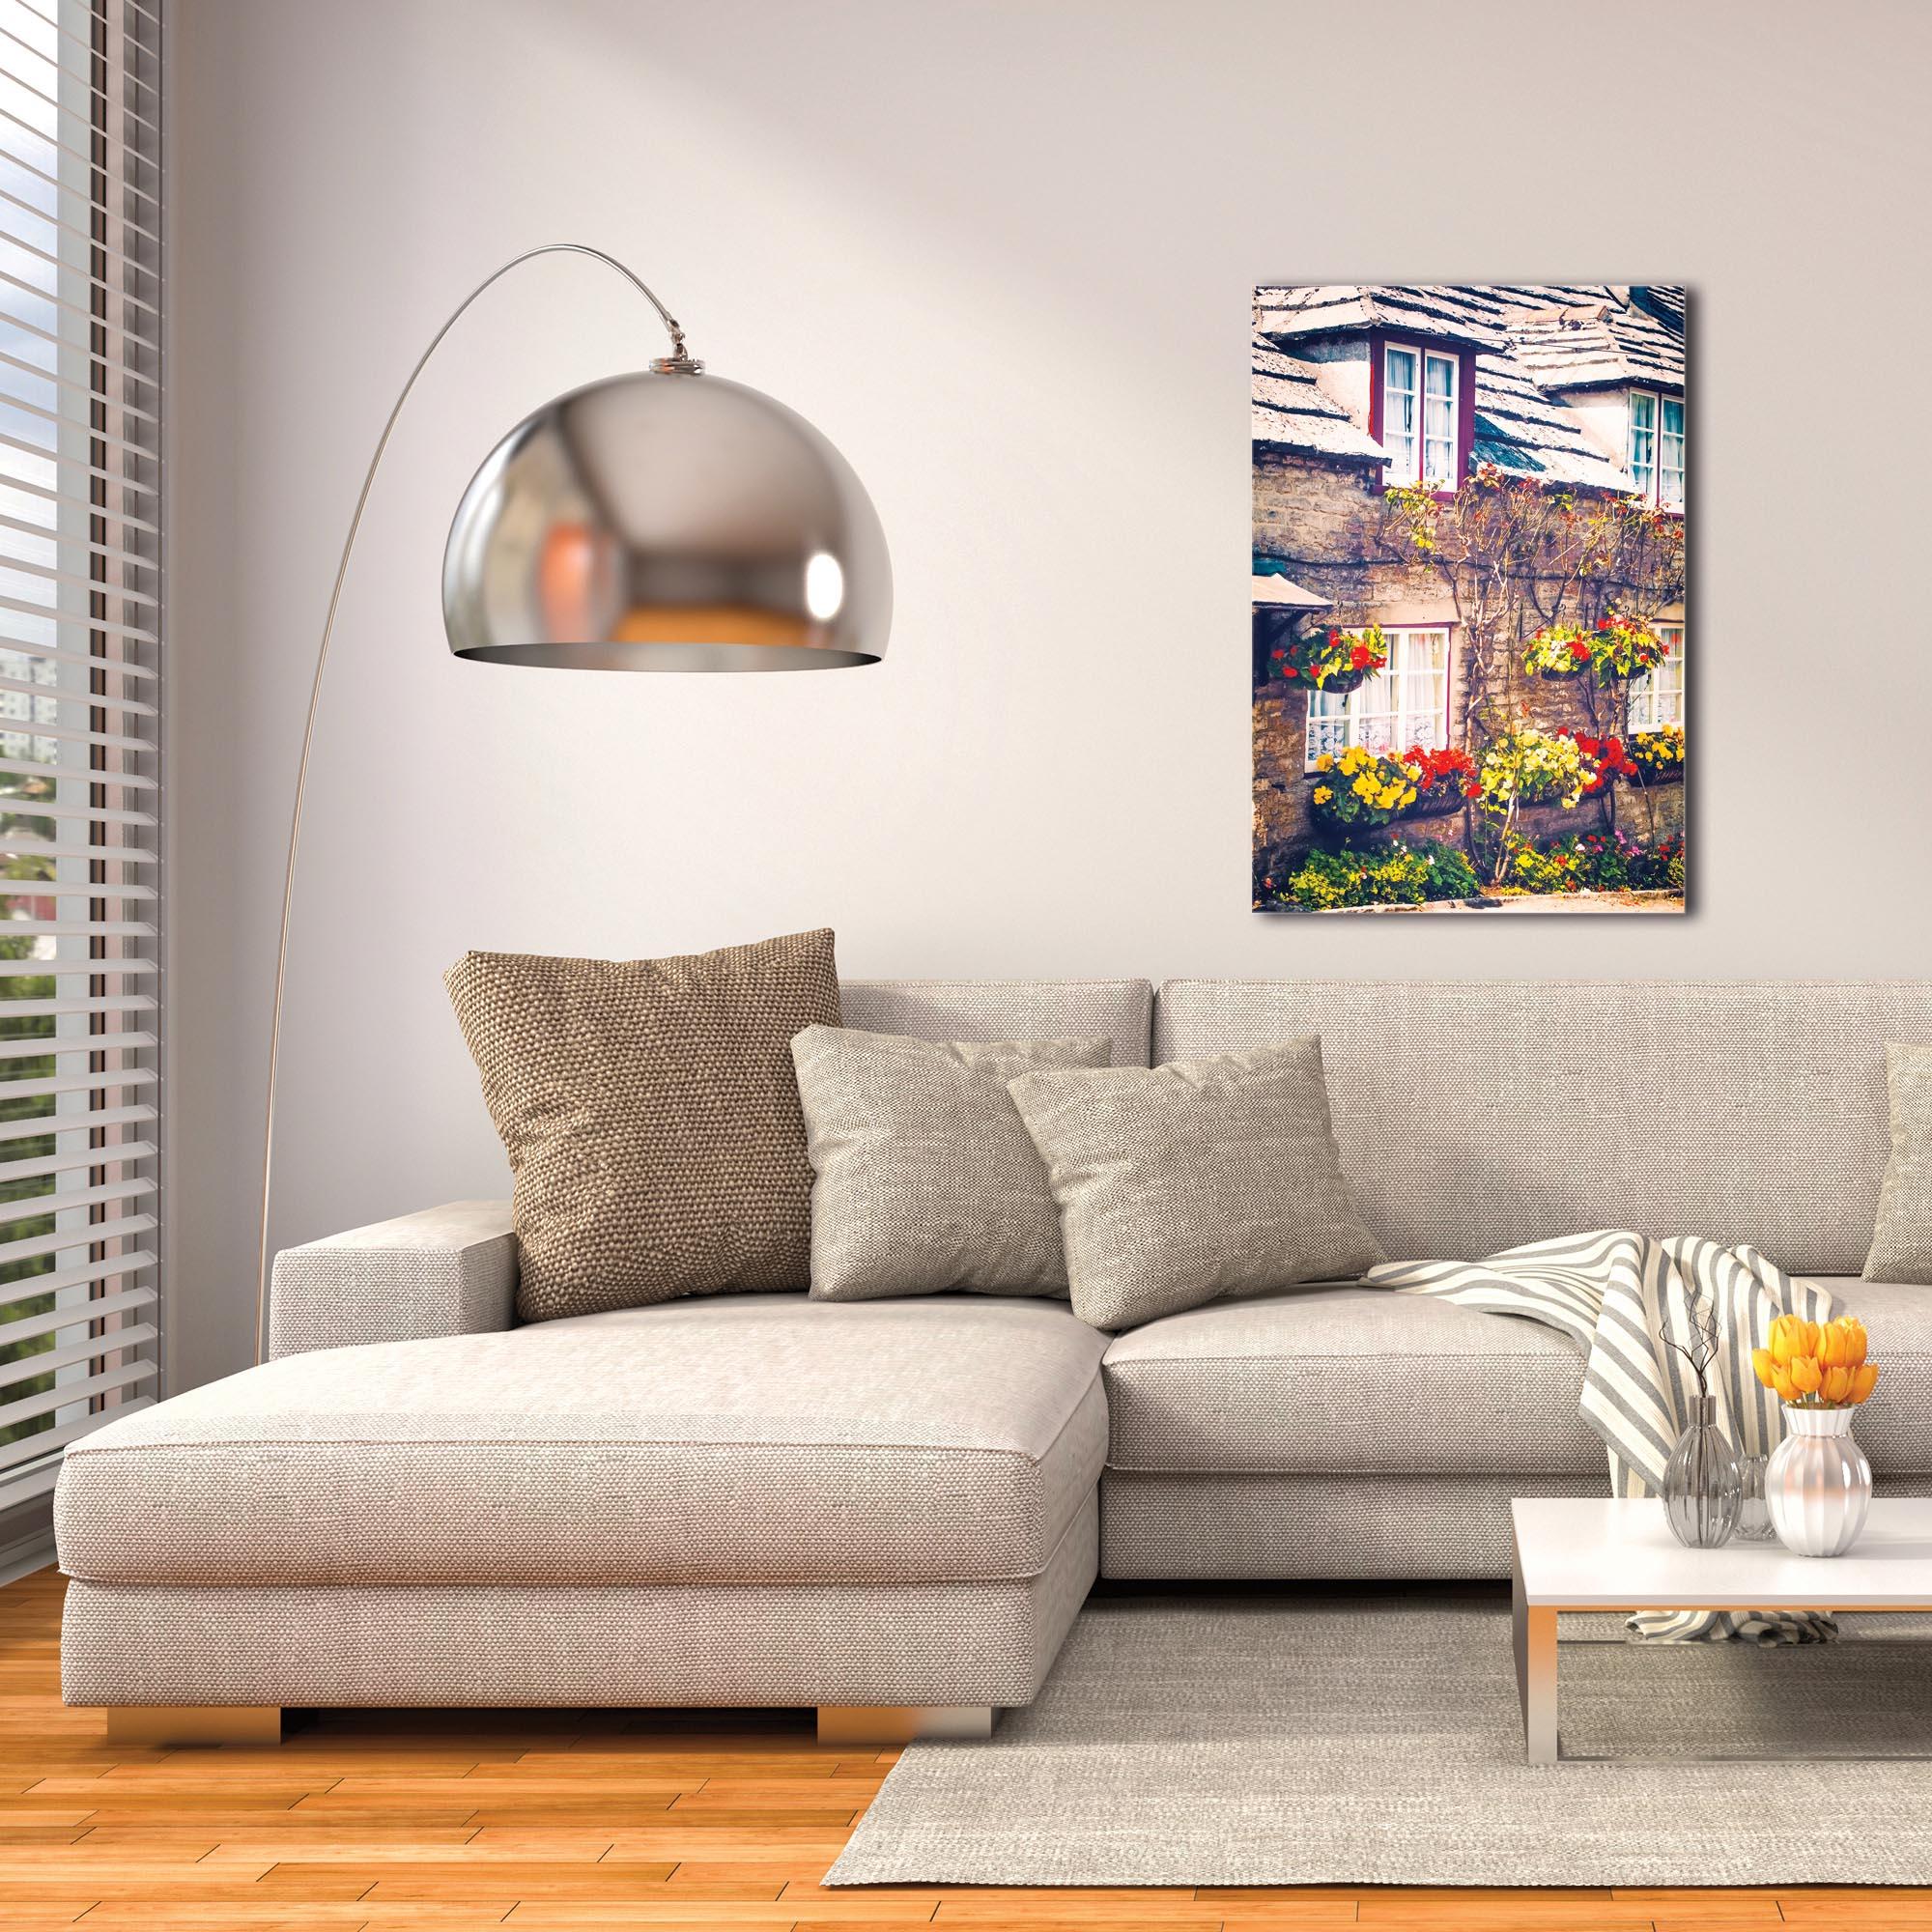 Cottage Wall Art 'Flowered Bricks' - Brick House Decor on Metal or Plexiglass - Image 3